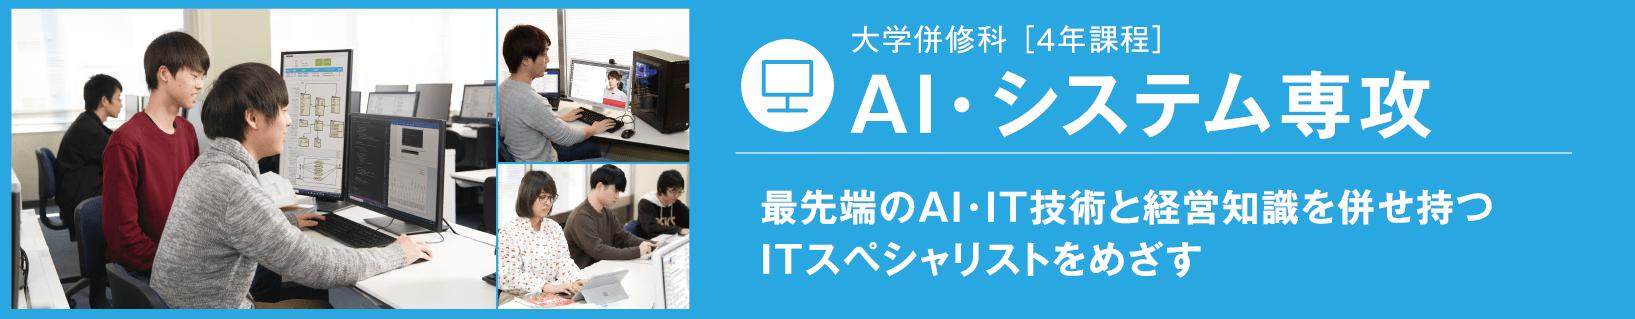 AI・システム専攻